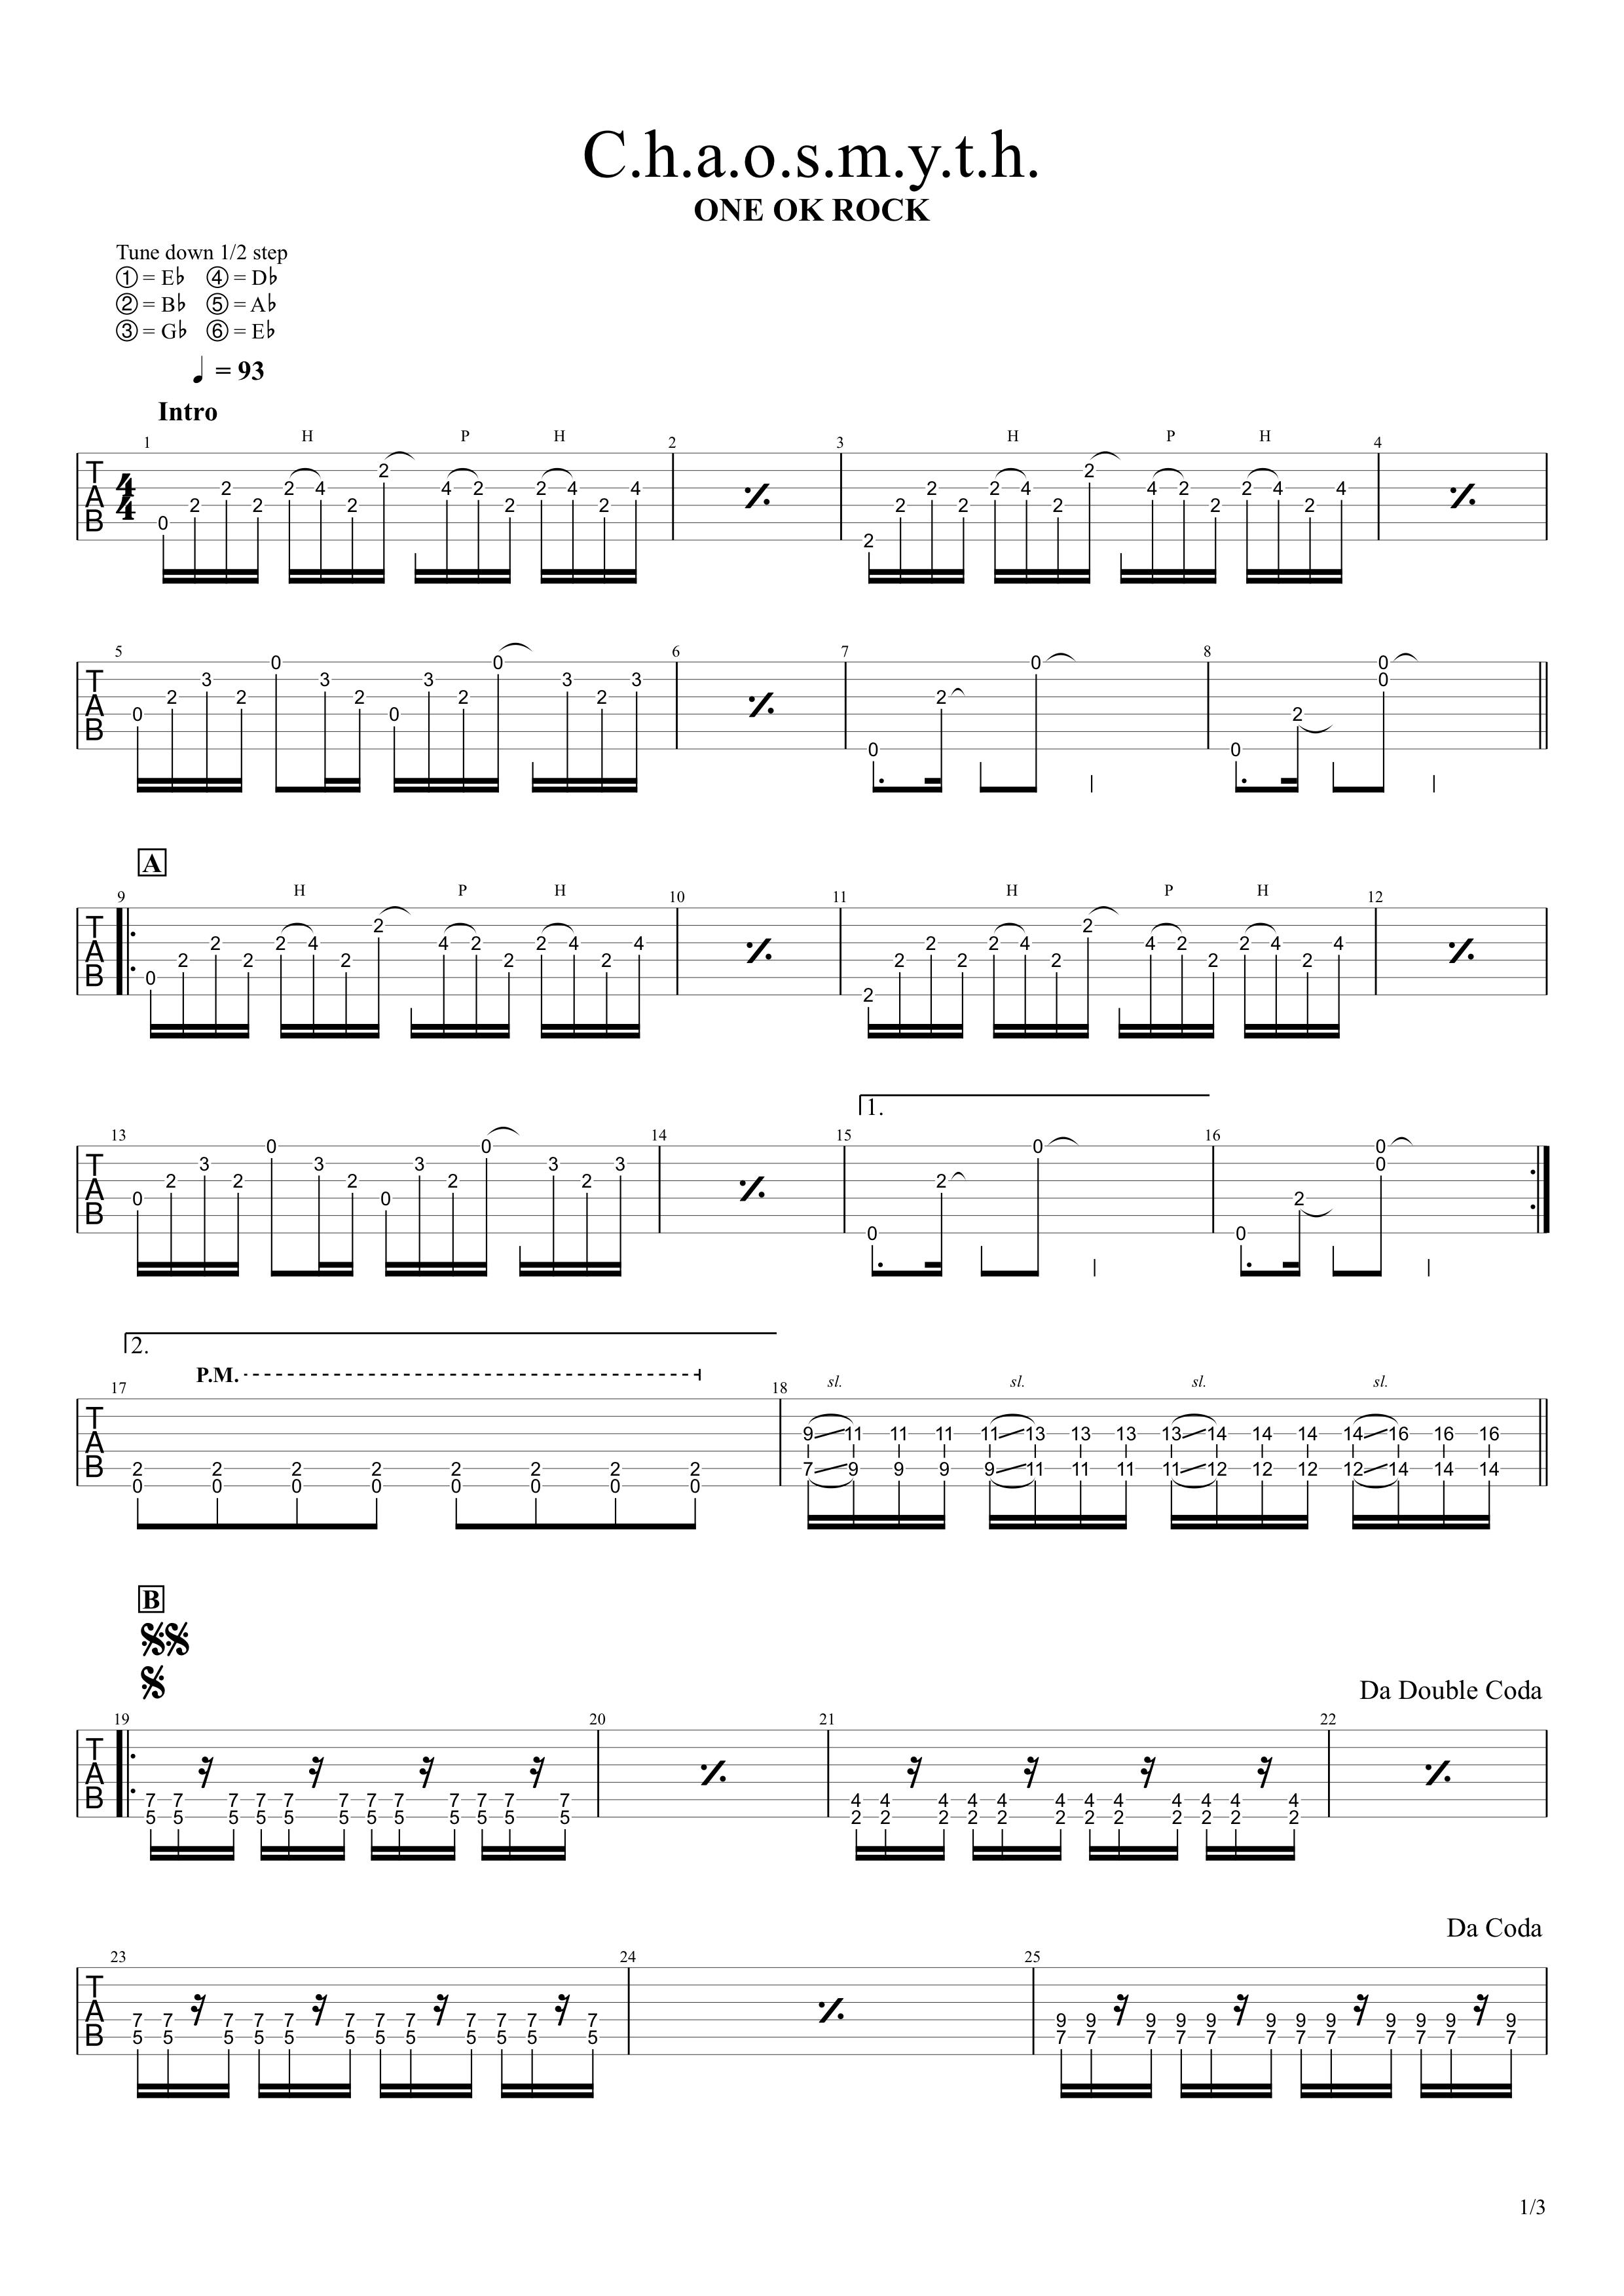 C.h.a.o.s.m.y.t.h/ONE OK ROCK ギタータブ譜スコア01